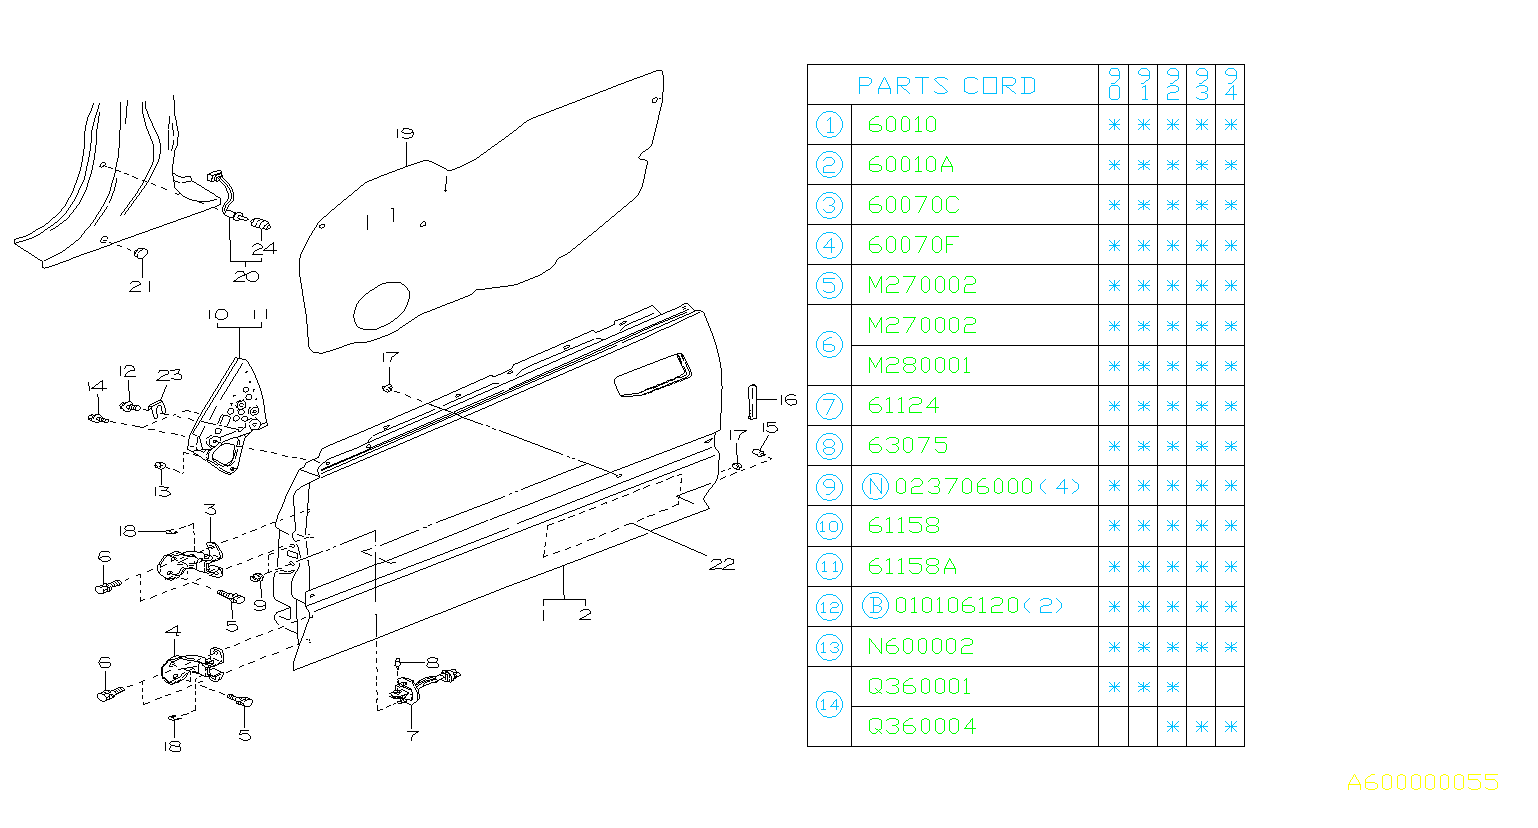 60152ga090 Pin Door Checker Panel Rear Front Body